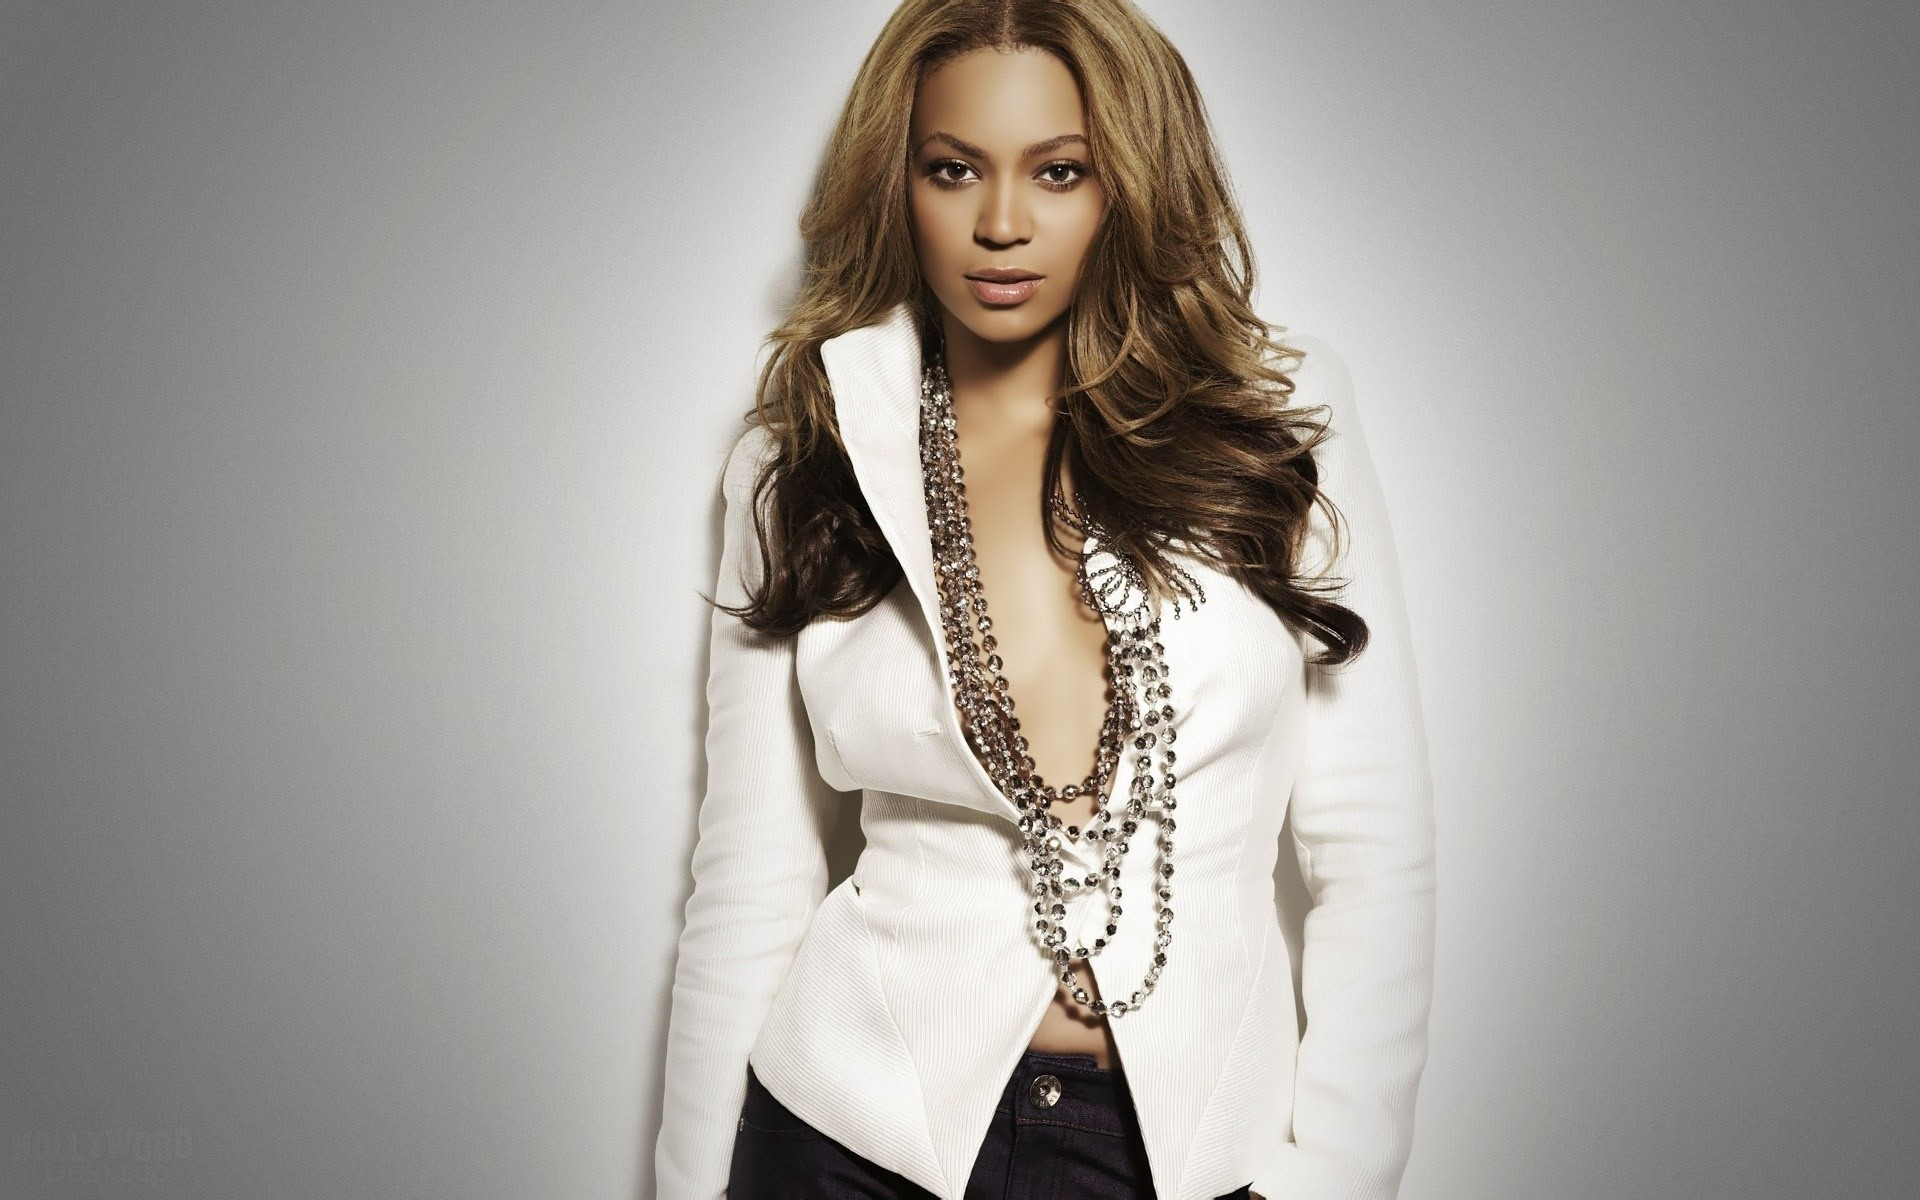 Beyonce Hd Wallpaper 73 Images